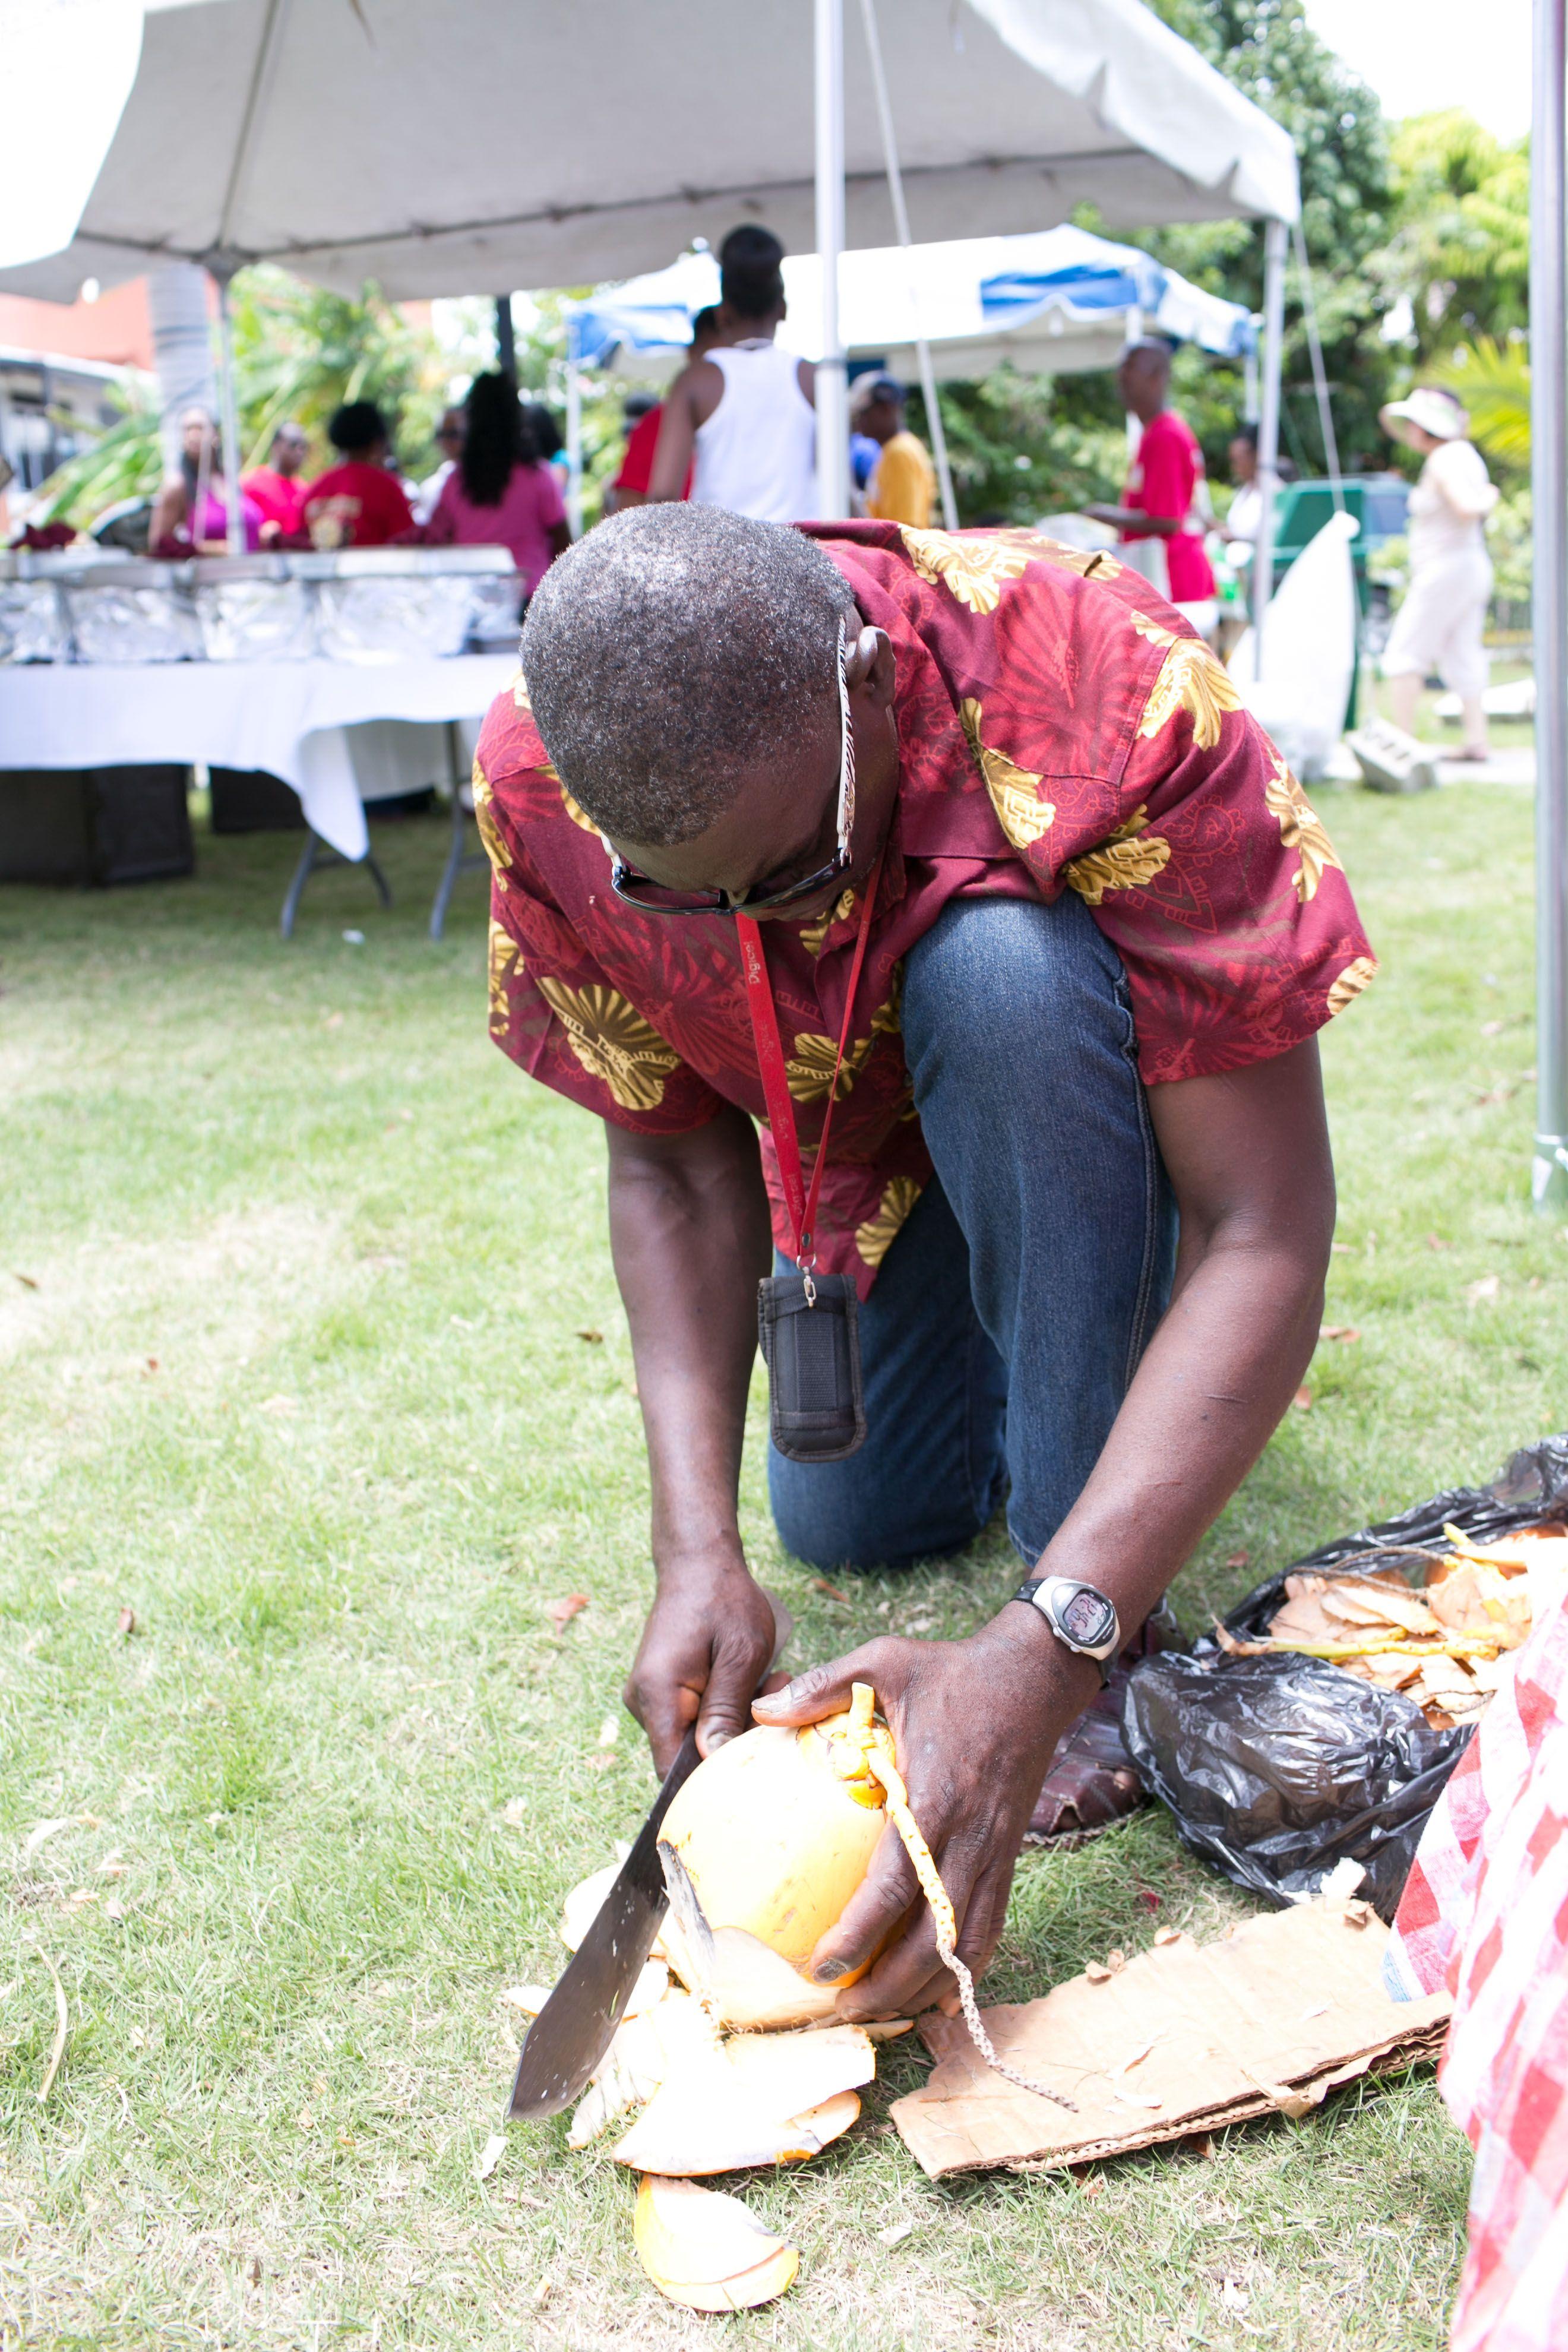 British Virgin Islands Emancipation Festival Food Fair Copyright ©Team Fotoshop